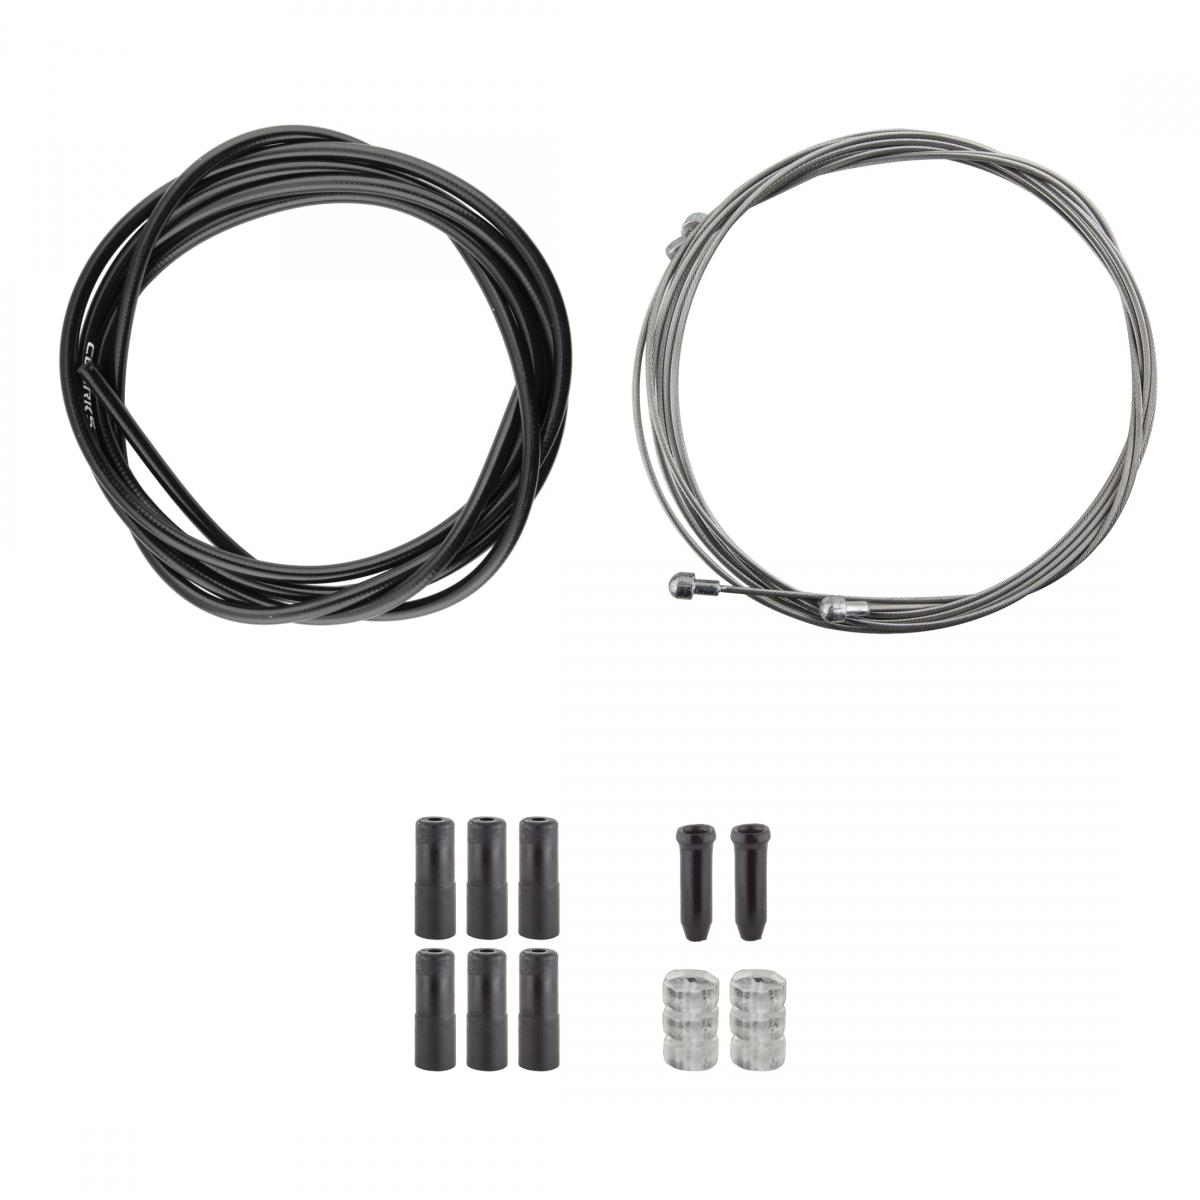 Black Ops Cable Brake Bk-Ops Kit Bmx Ftorrr Cp-Bk Lined-Housing 67X69In